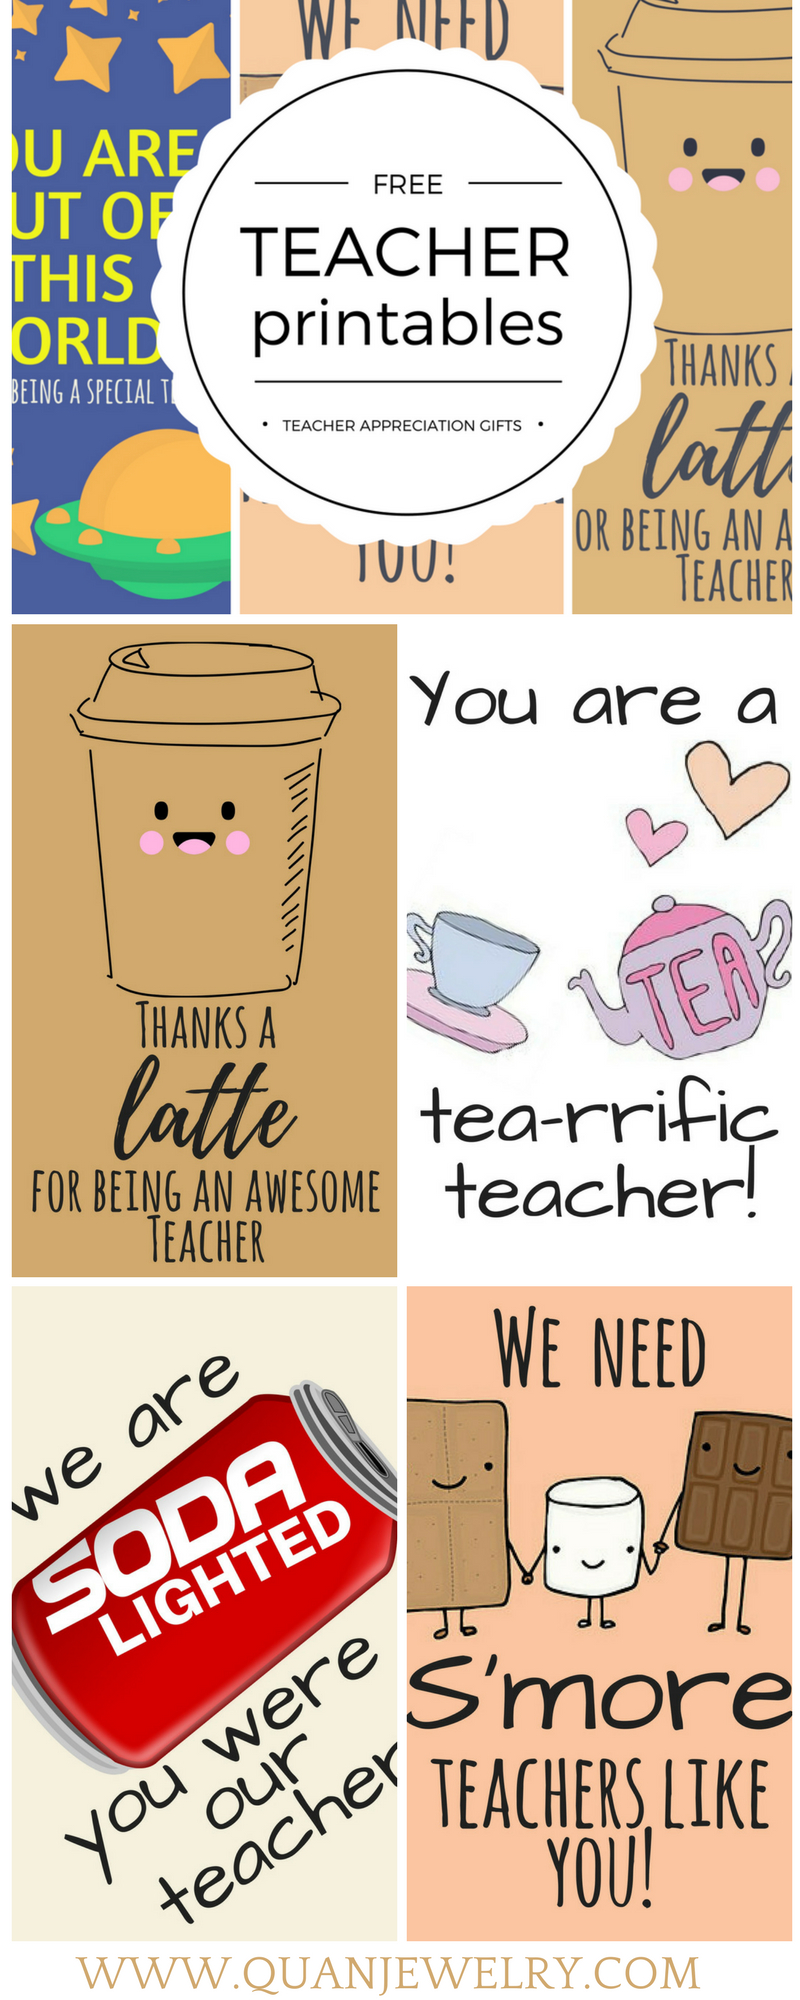 Free Printable Teacher Appreciation Thank You Cards | Teacher Gift - Free Printable Teacher Appreciation Cards